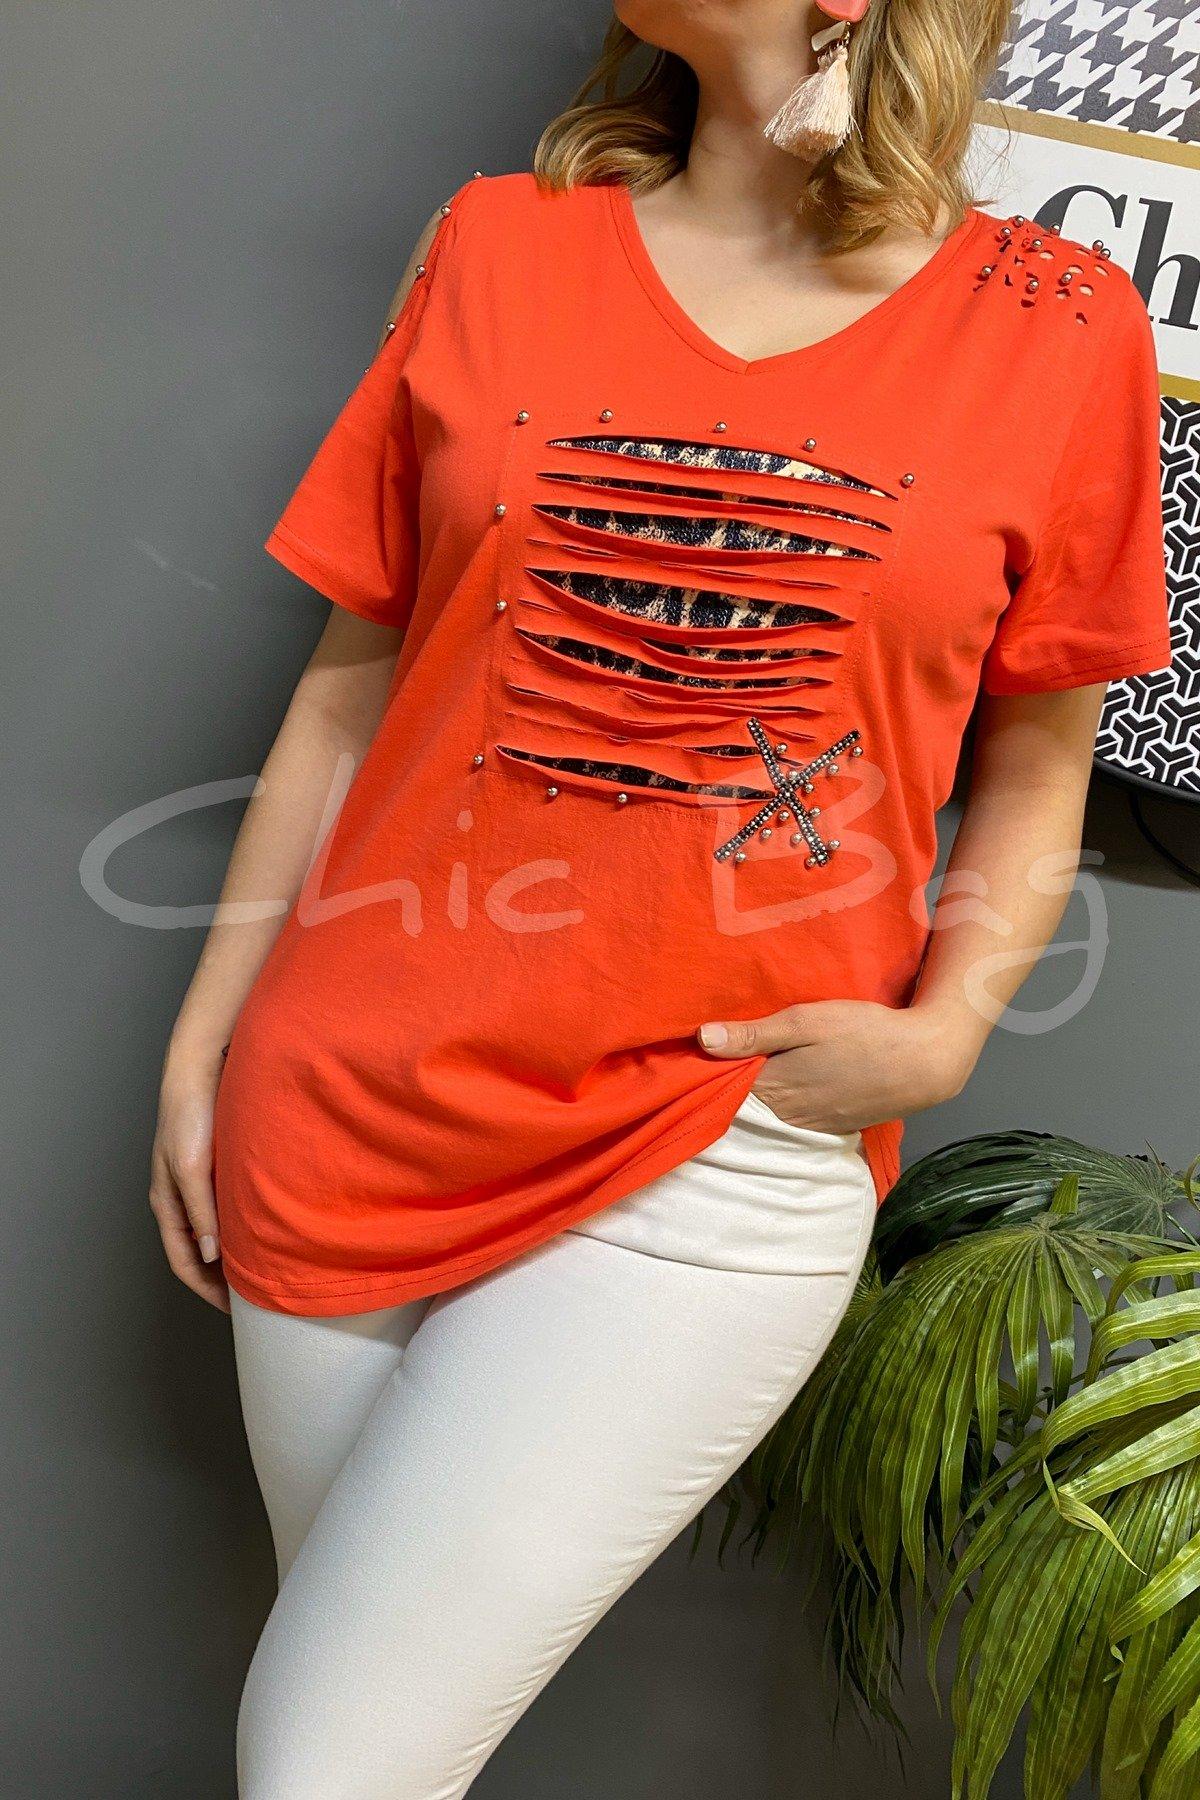 https://resim.chicbag.com.tr/p000406/mrc/onu-kesik-leopar-desenli-omuz-dekolteli-boncuk-islemeli-tshirt-swns-012e6bf3bd3d.